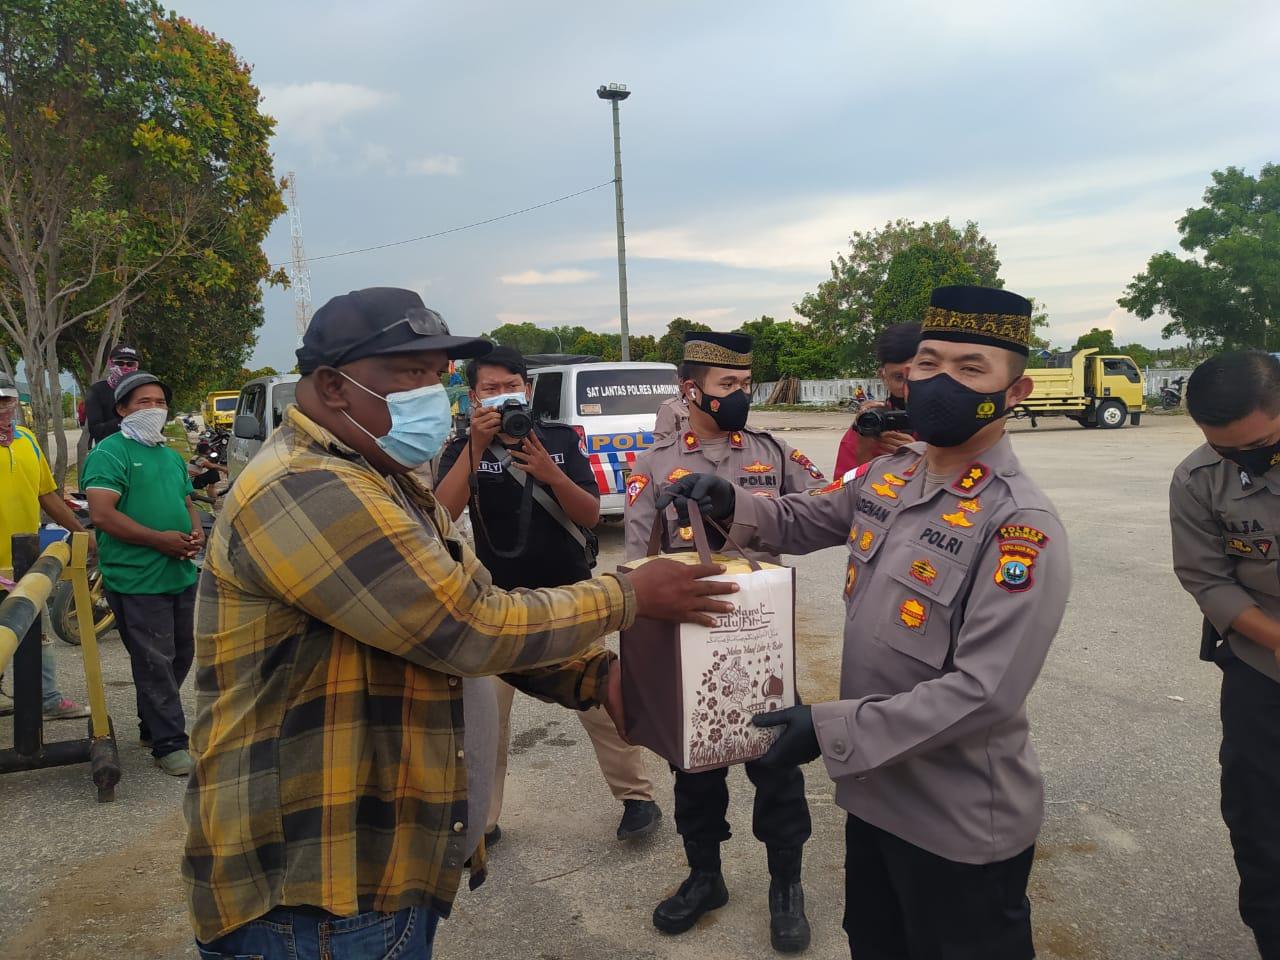 Foto hari buruh, Kapolres Karimun, karimun, Paket sembako, paket sembako untuk buruh, pekerja bongkar muat, pelabuhan, Peringatan hari buruh